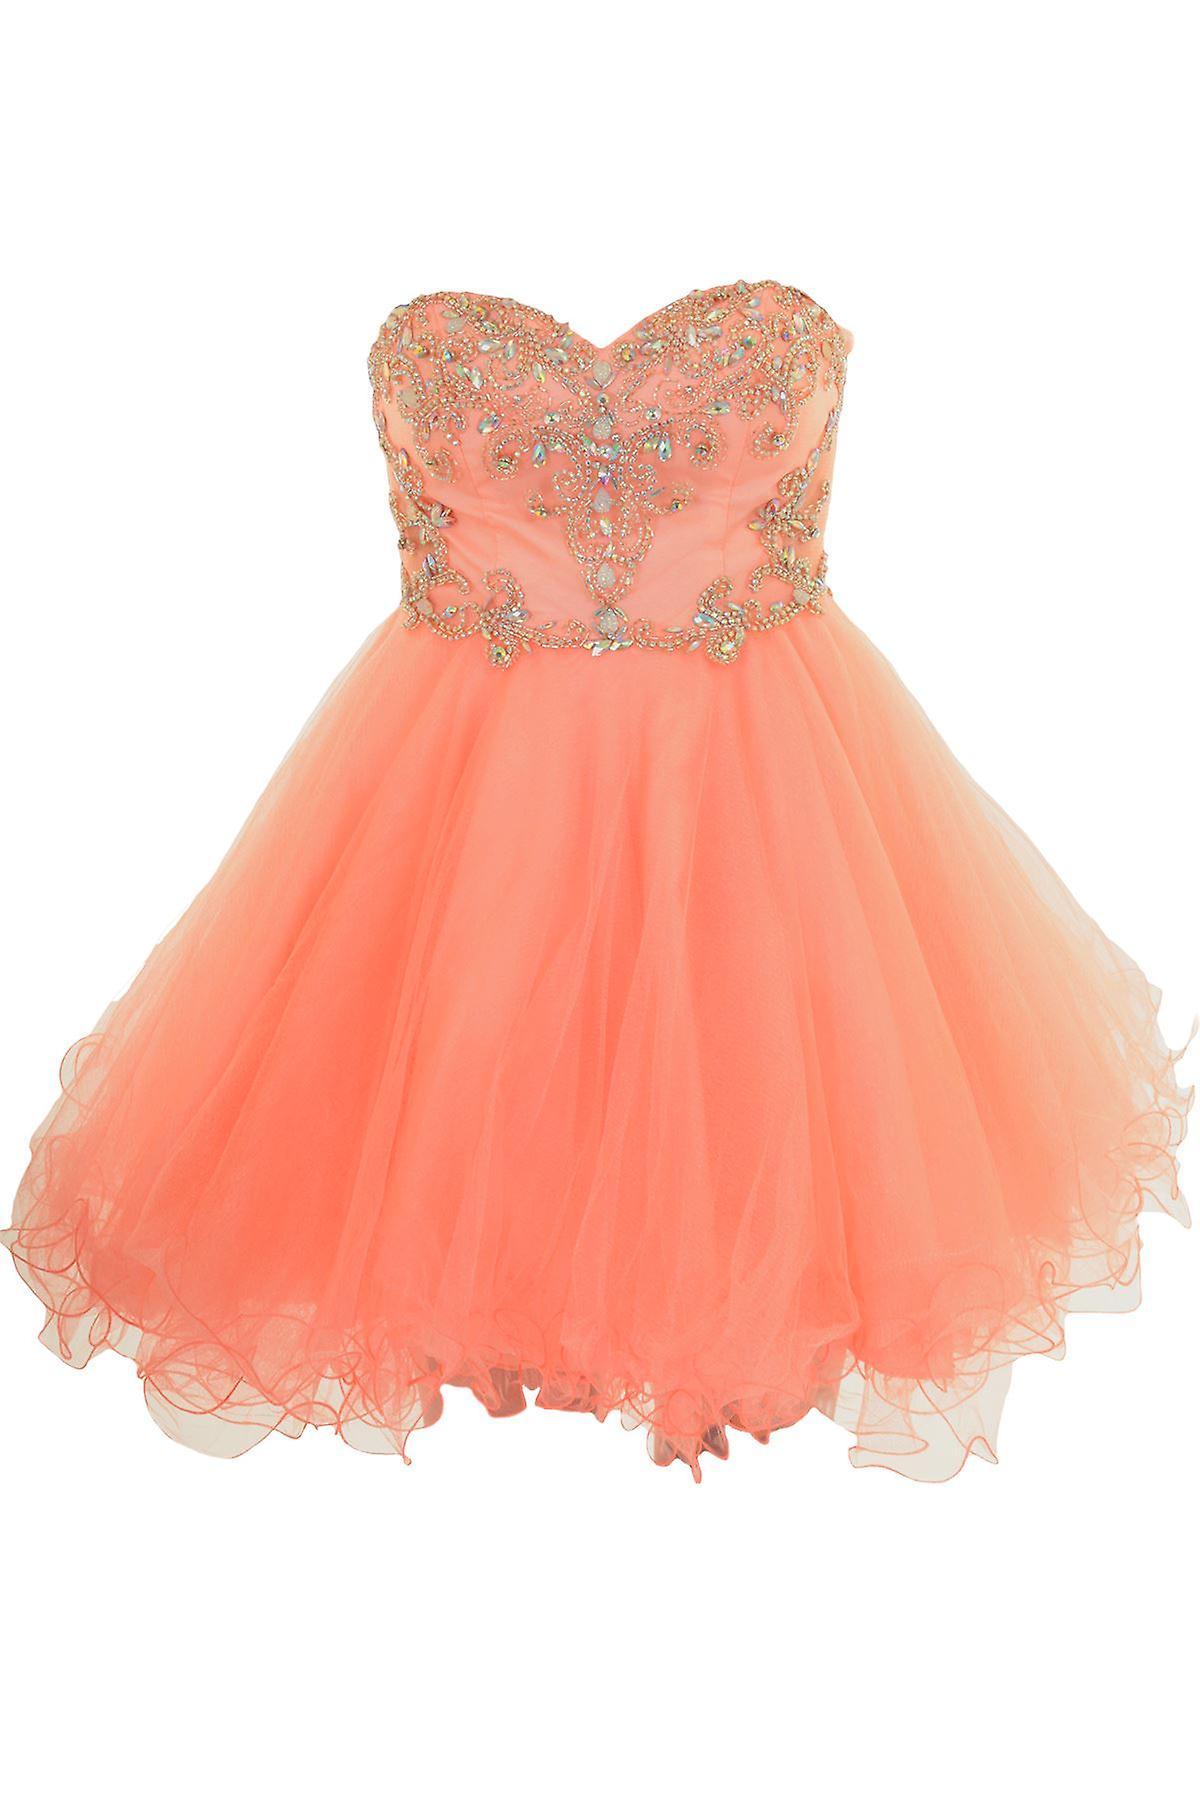 Kort Mini Boobtube Chiffon Puff Tutu Prom brudepike Mesh Cocktail Party kjole